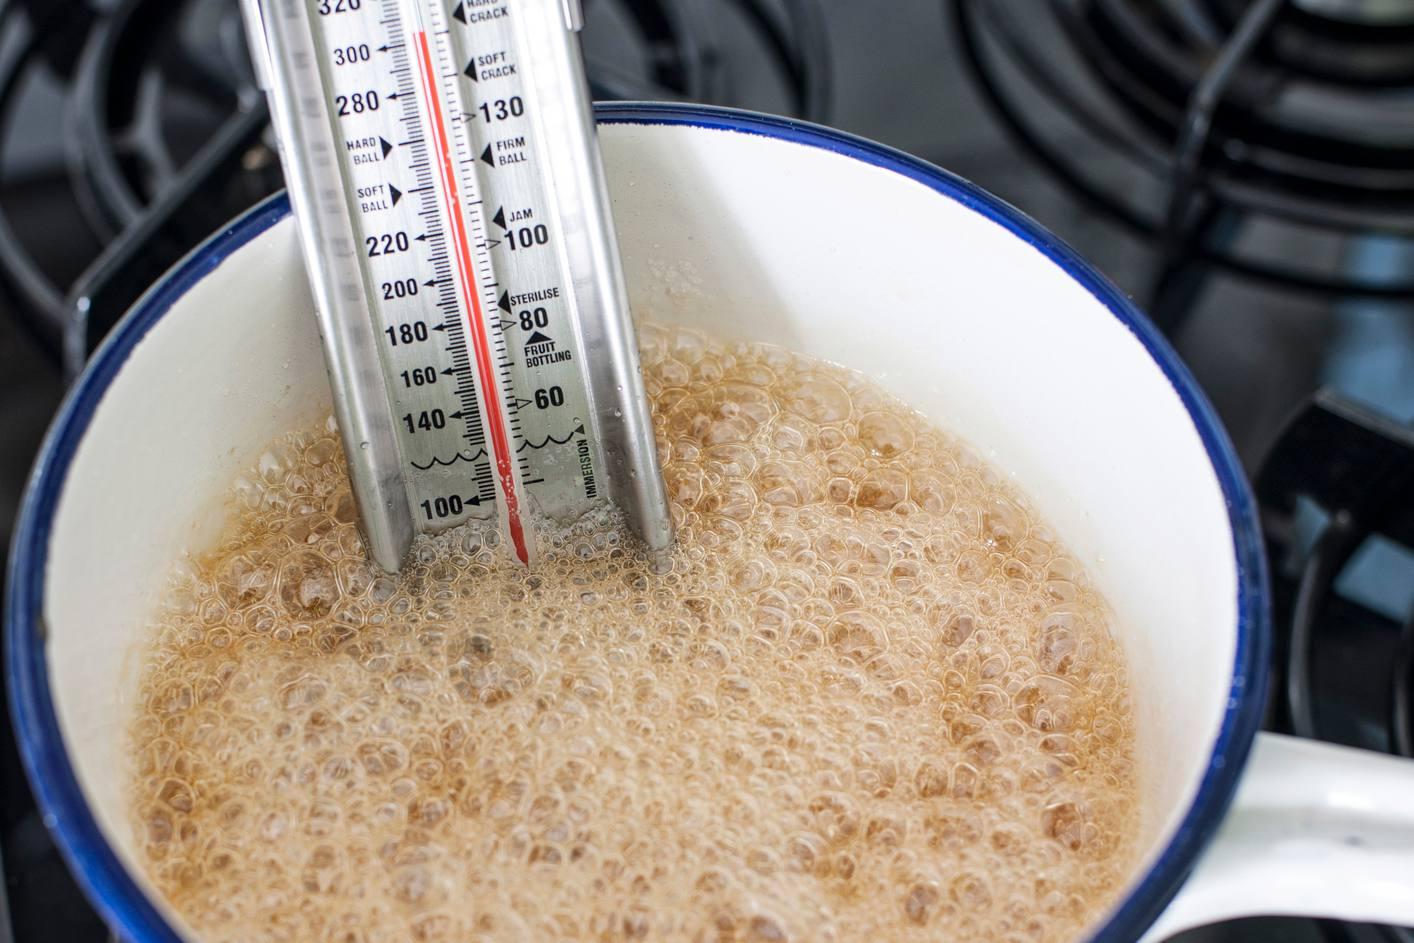 Syrup temperature